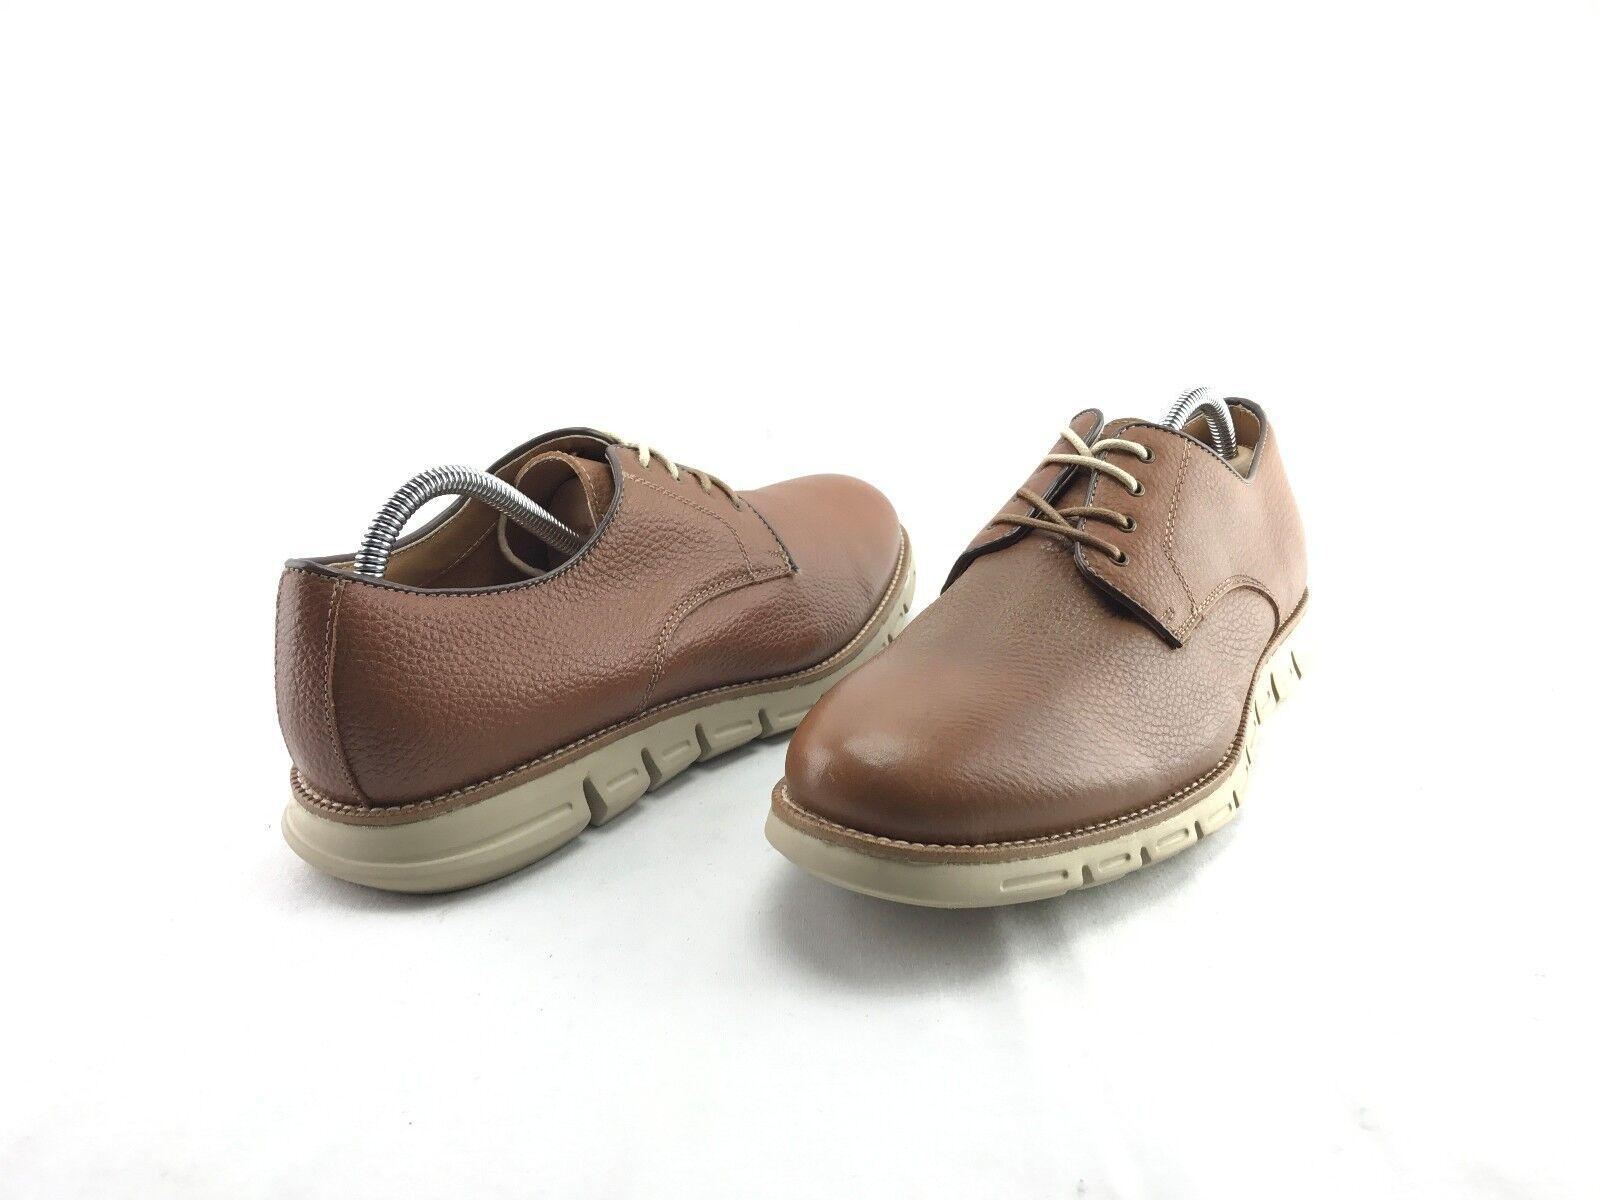 NEW GBX Hart Men's Lace Up Fashion Cognac Leather Oxford US Size 9 M shoes